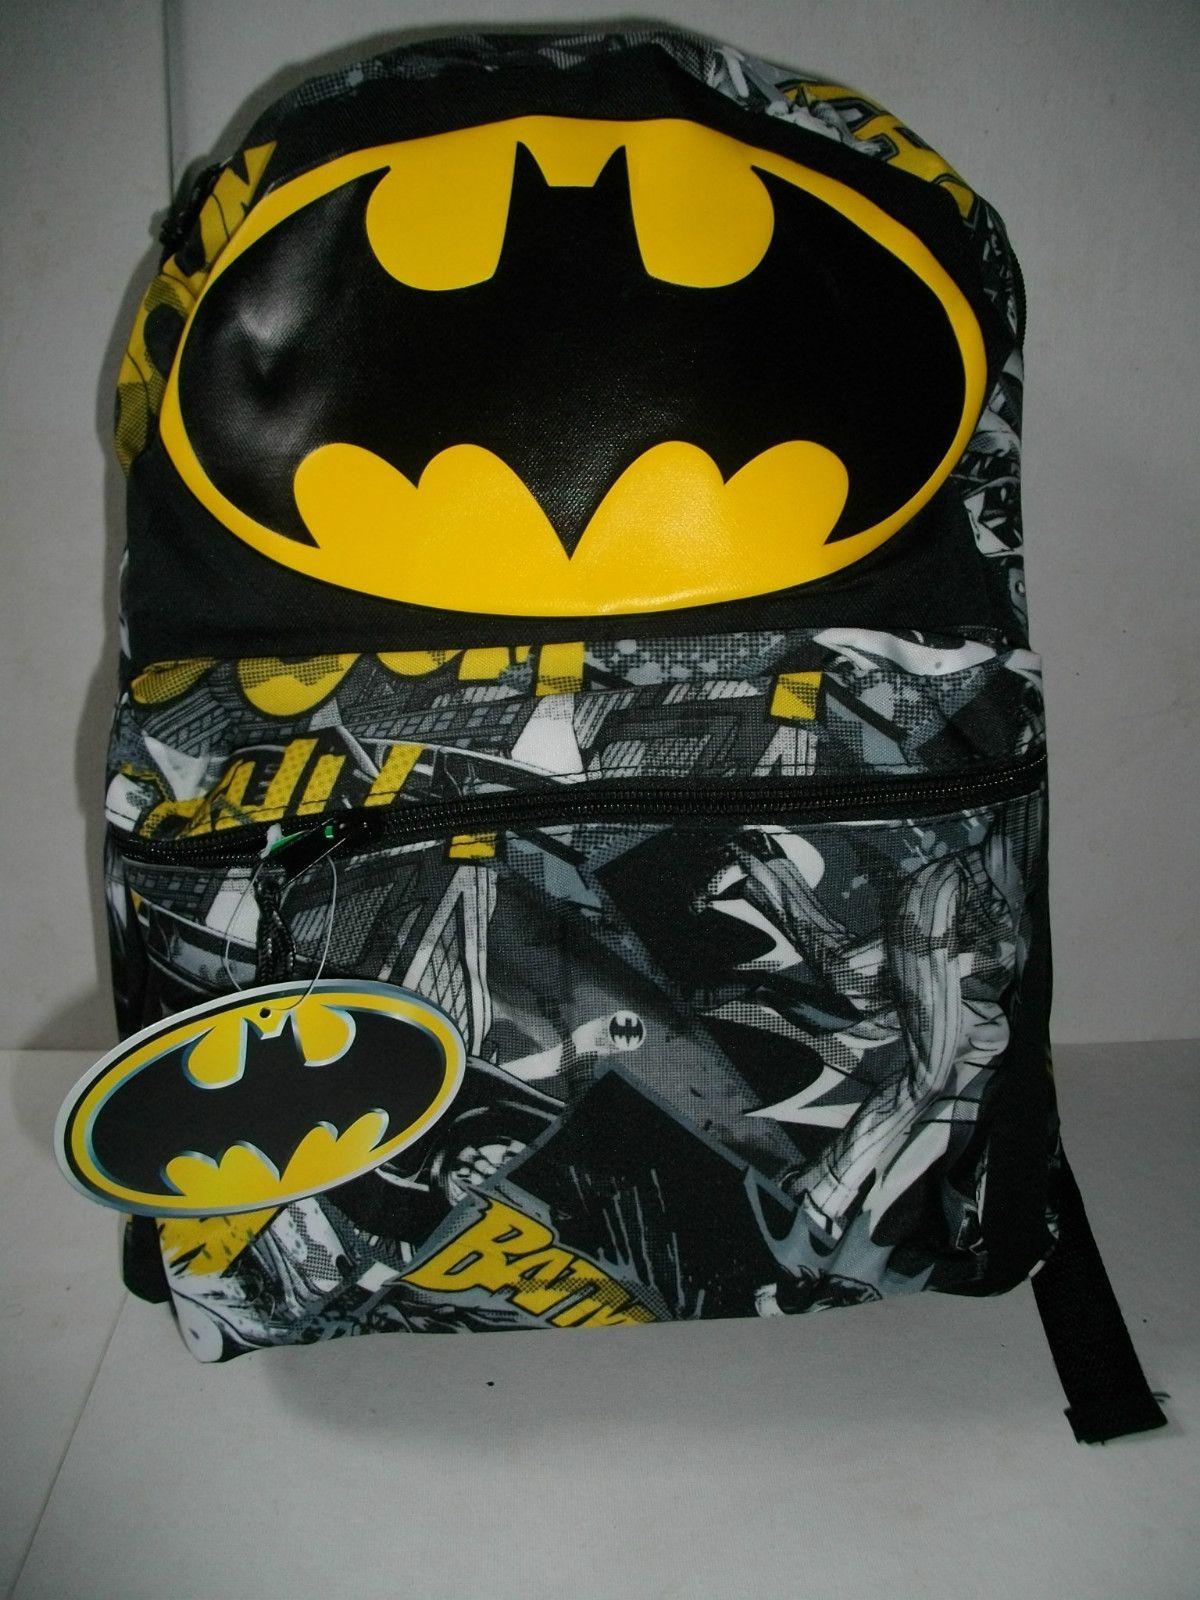 new batman dc ics licensed 16 backpack school book bag